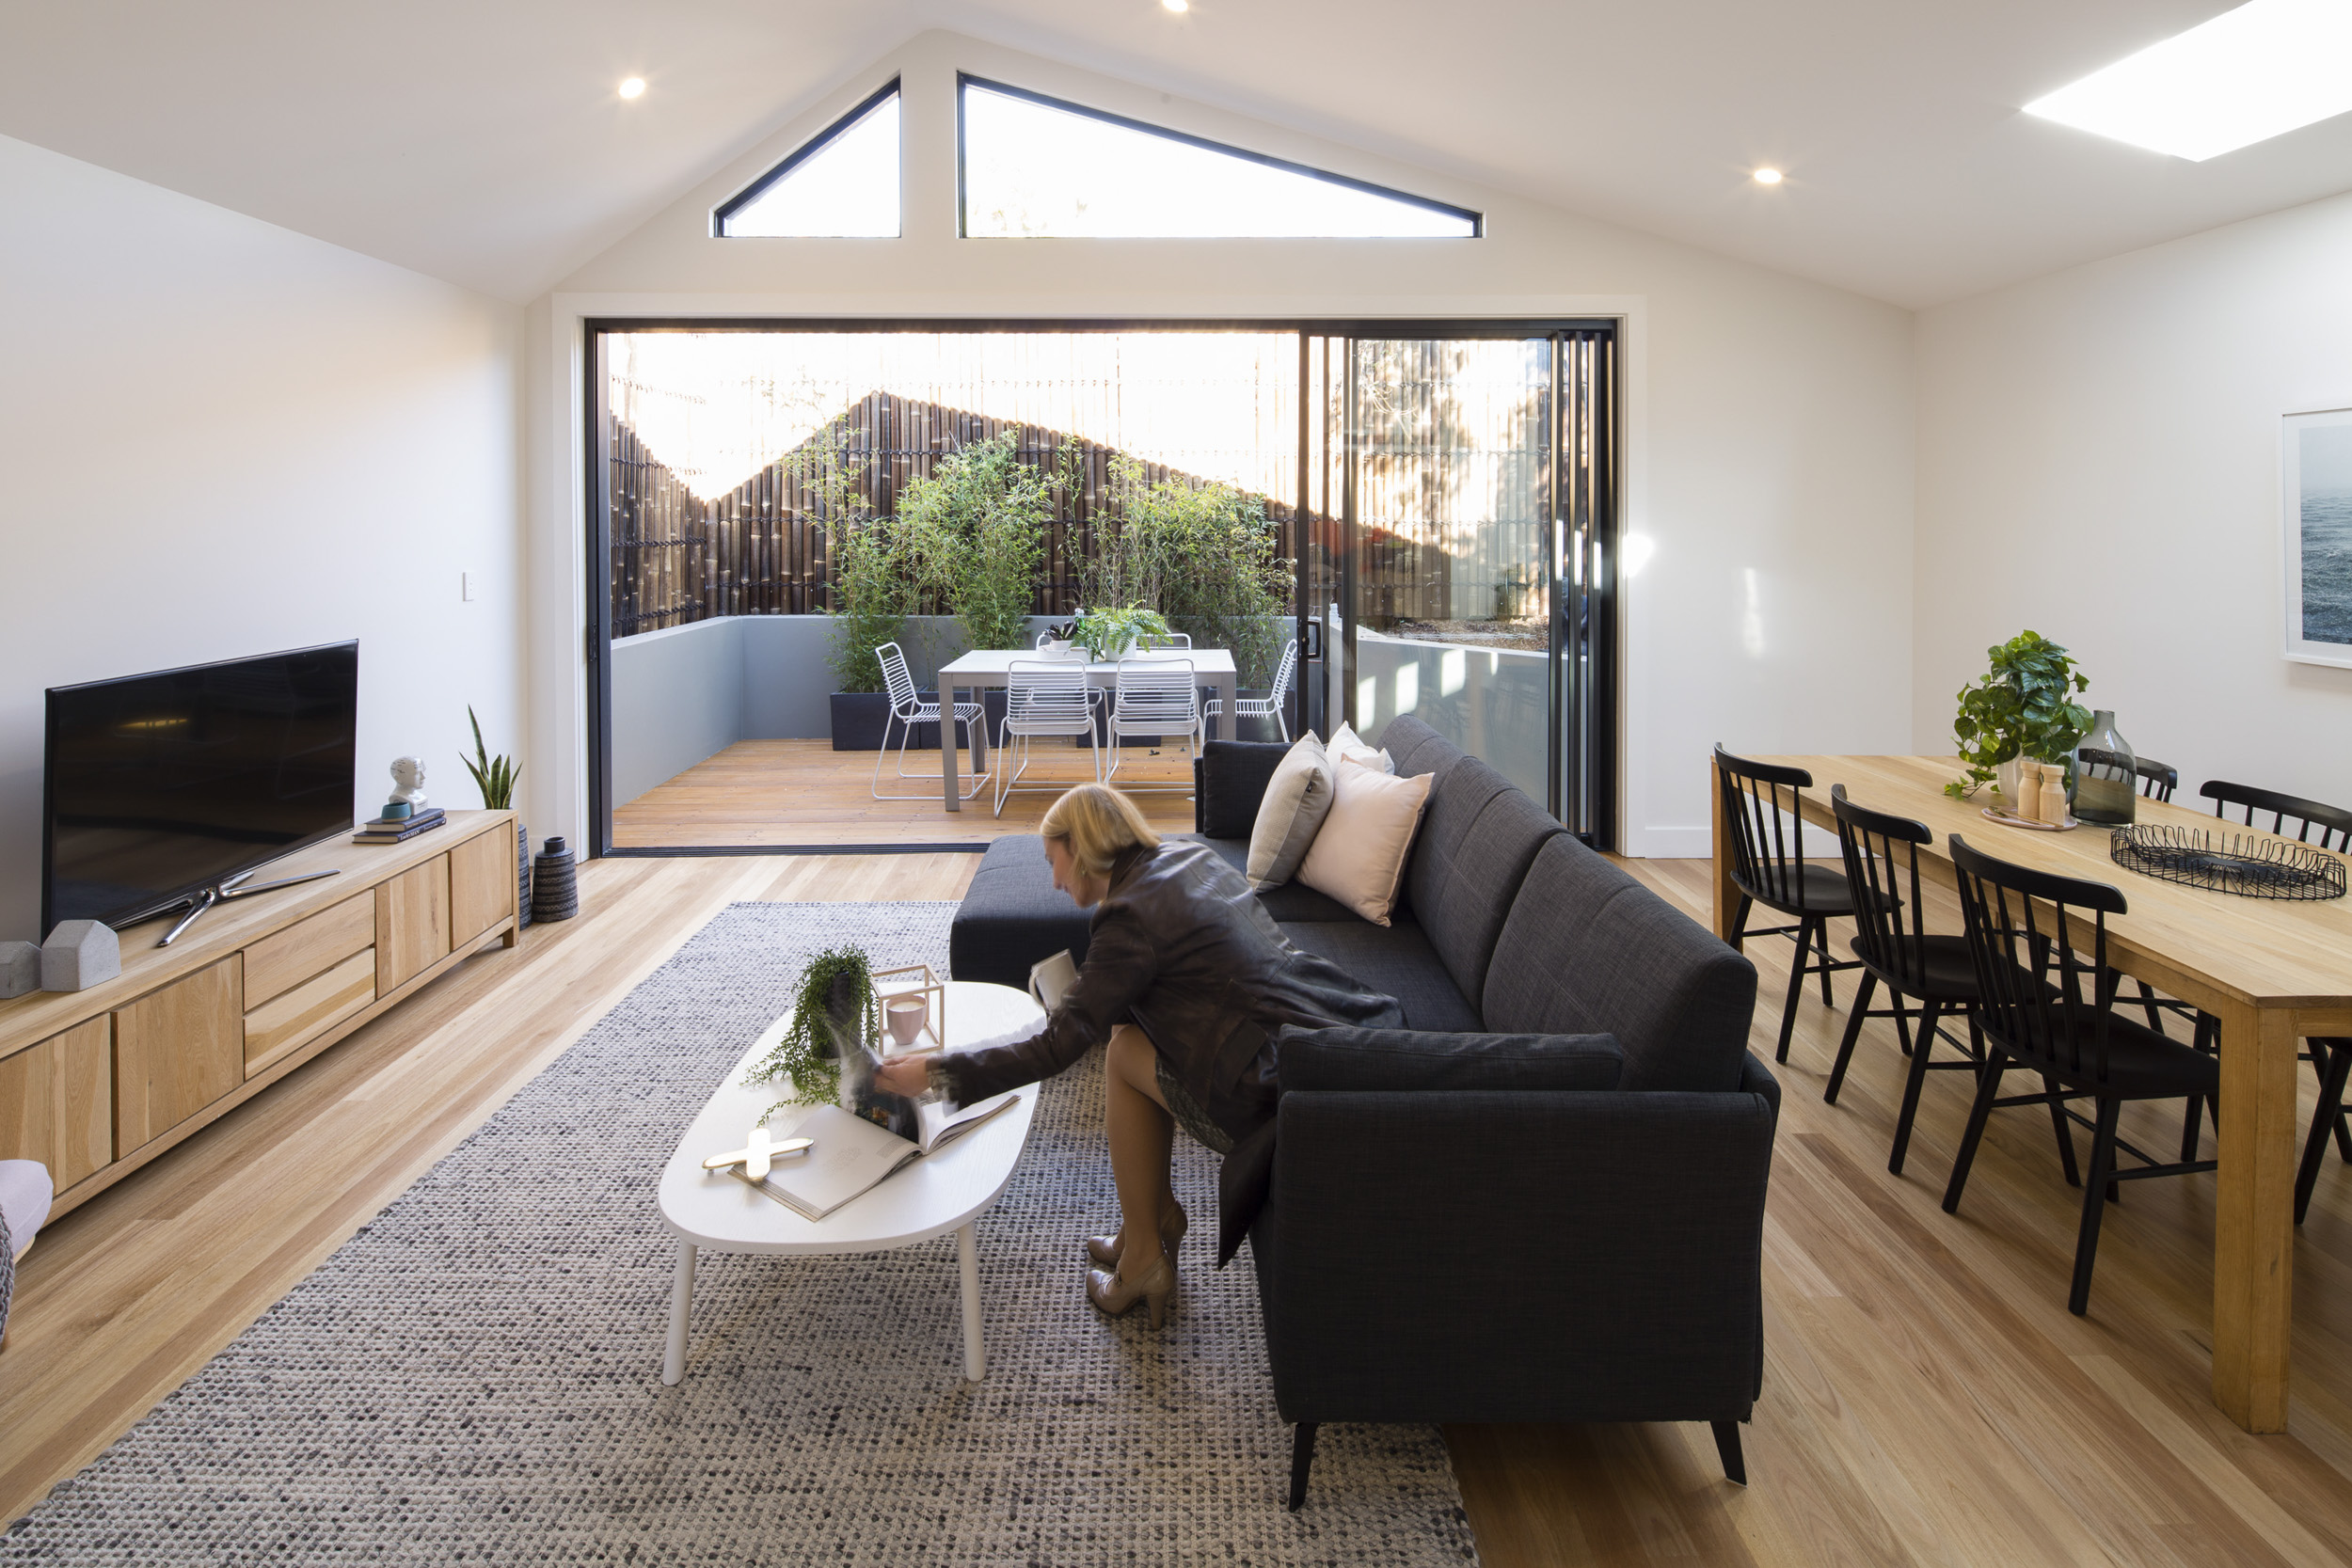 house_photographer_sydney_ns_studio_architects_07.jpg